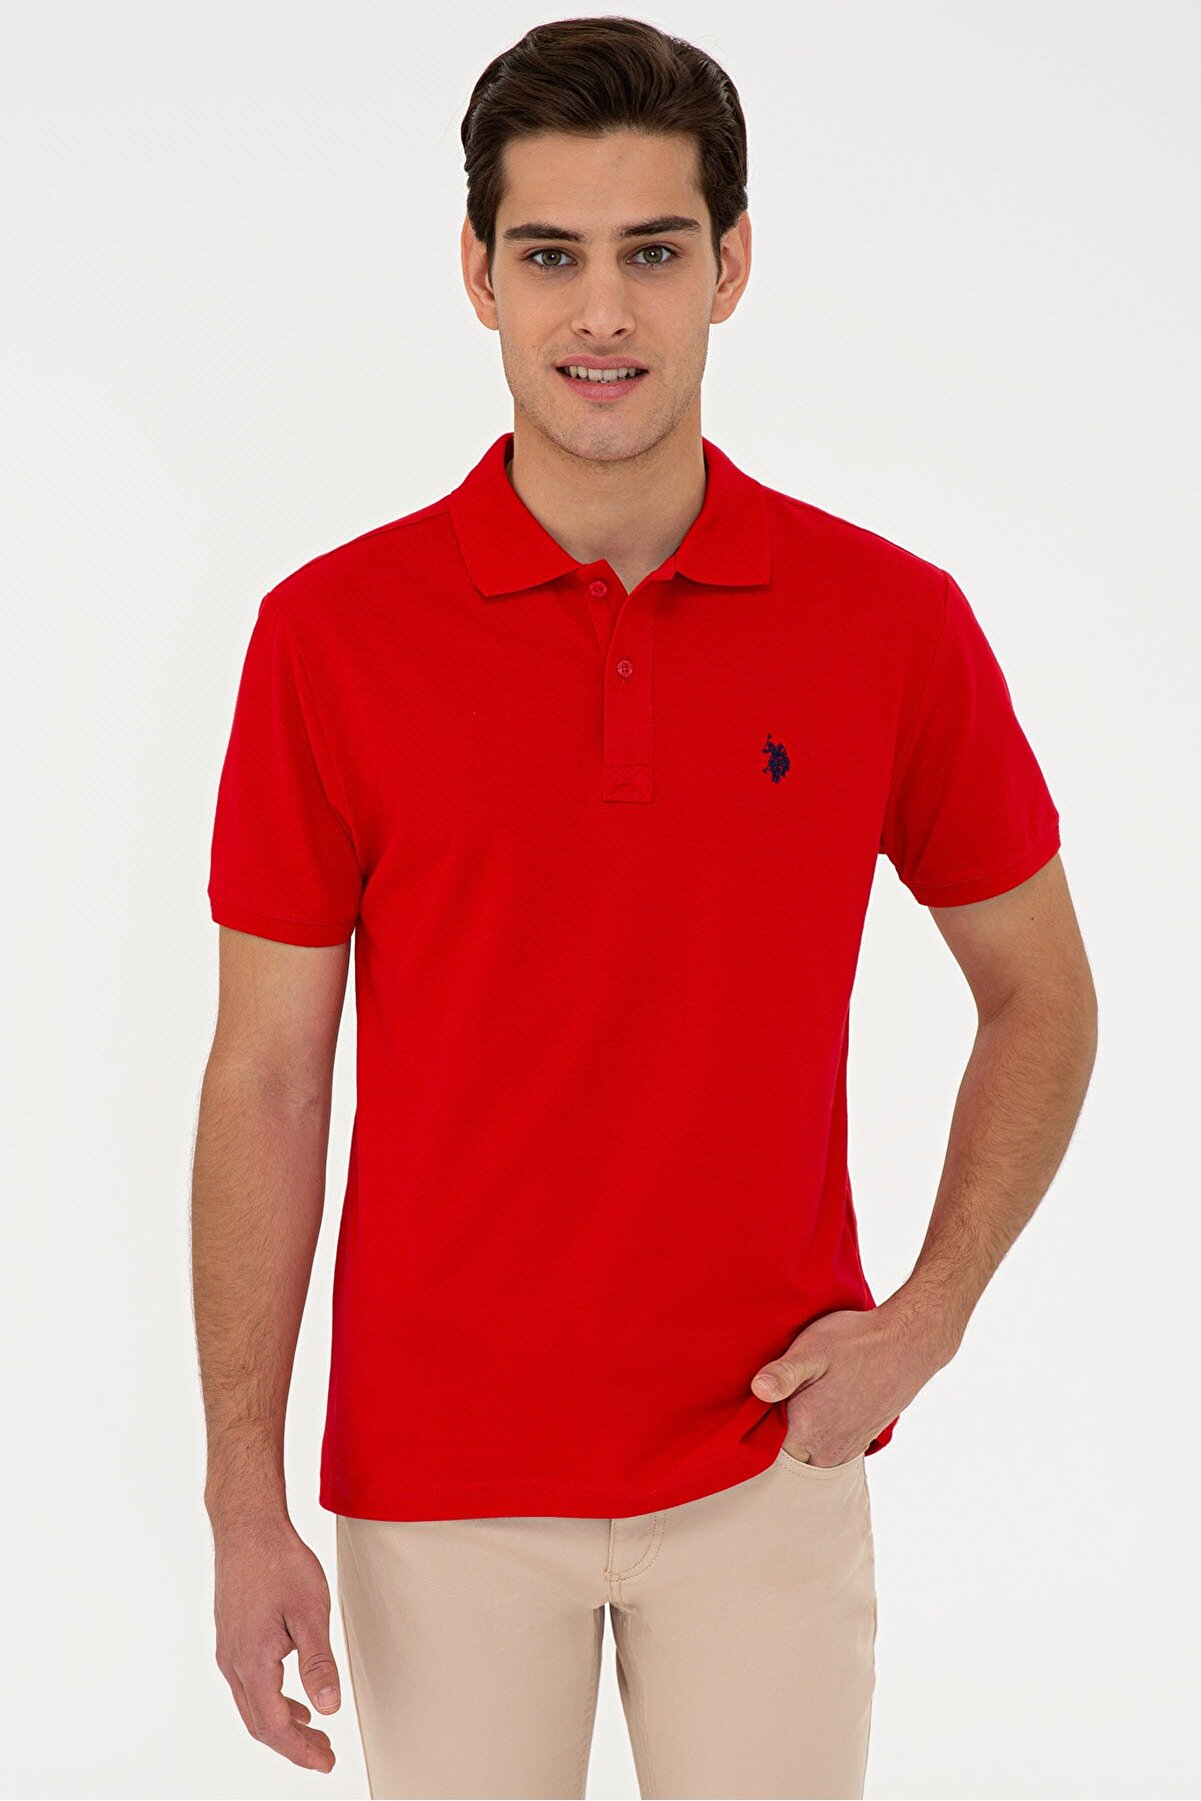 US Polo Assn Kırmızı Erkek T-Shirt